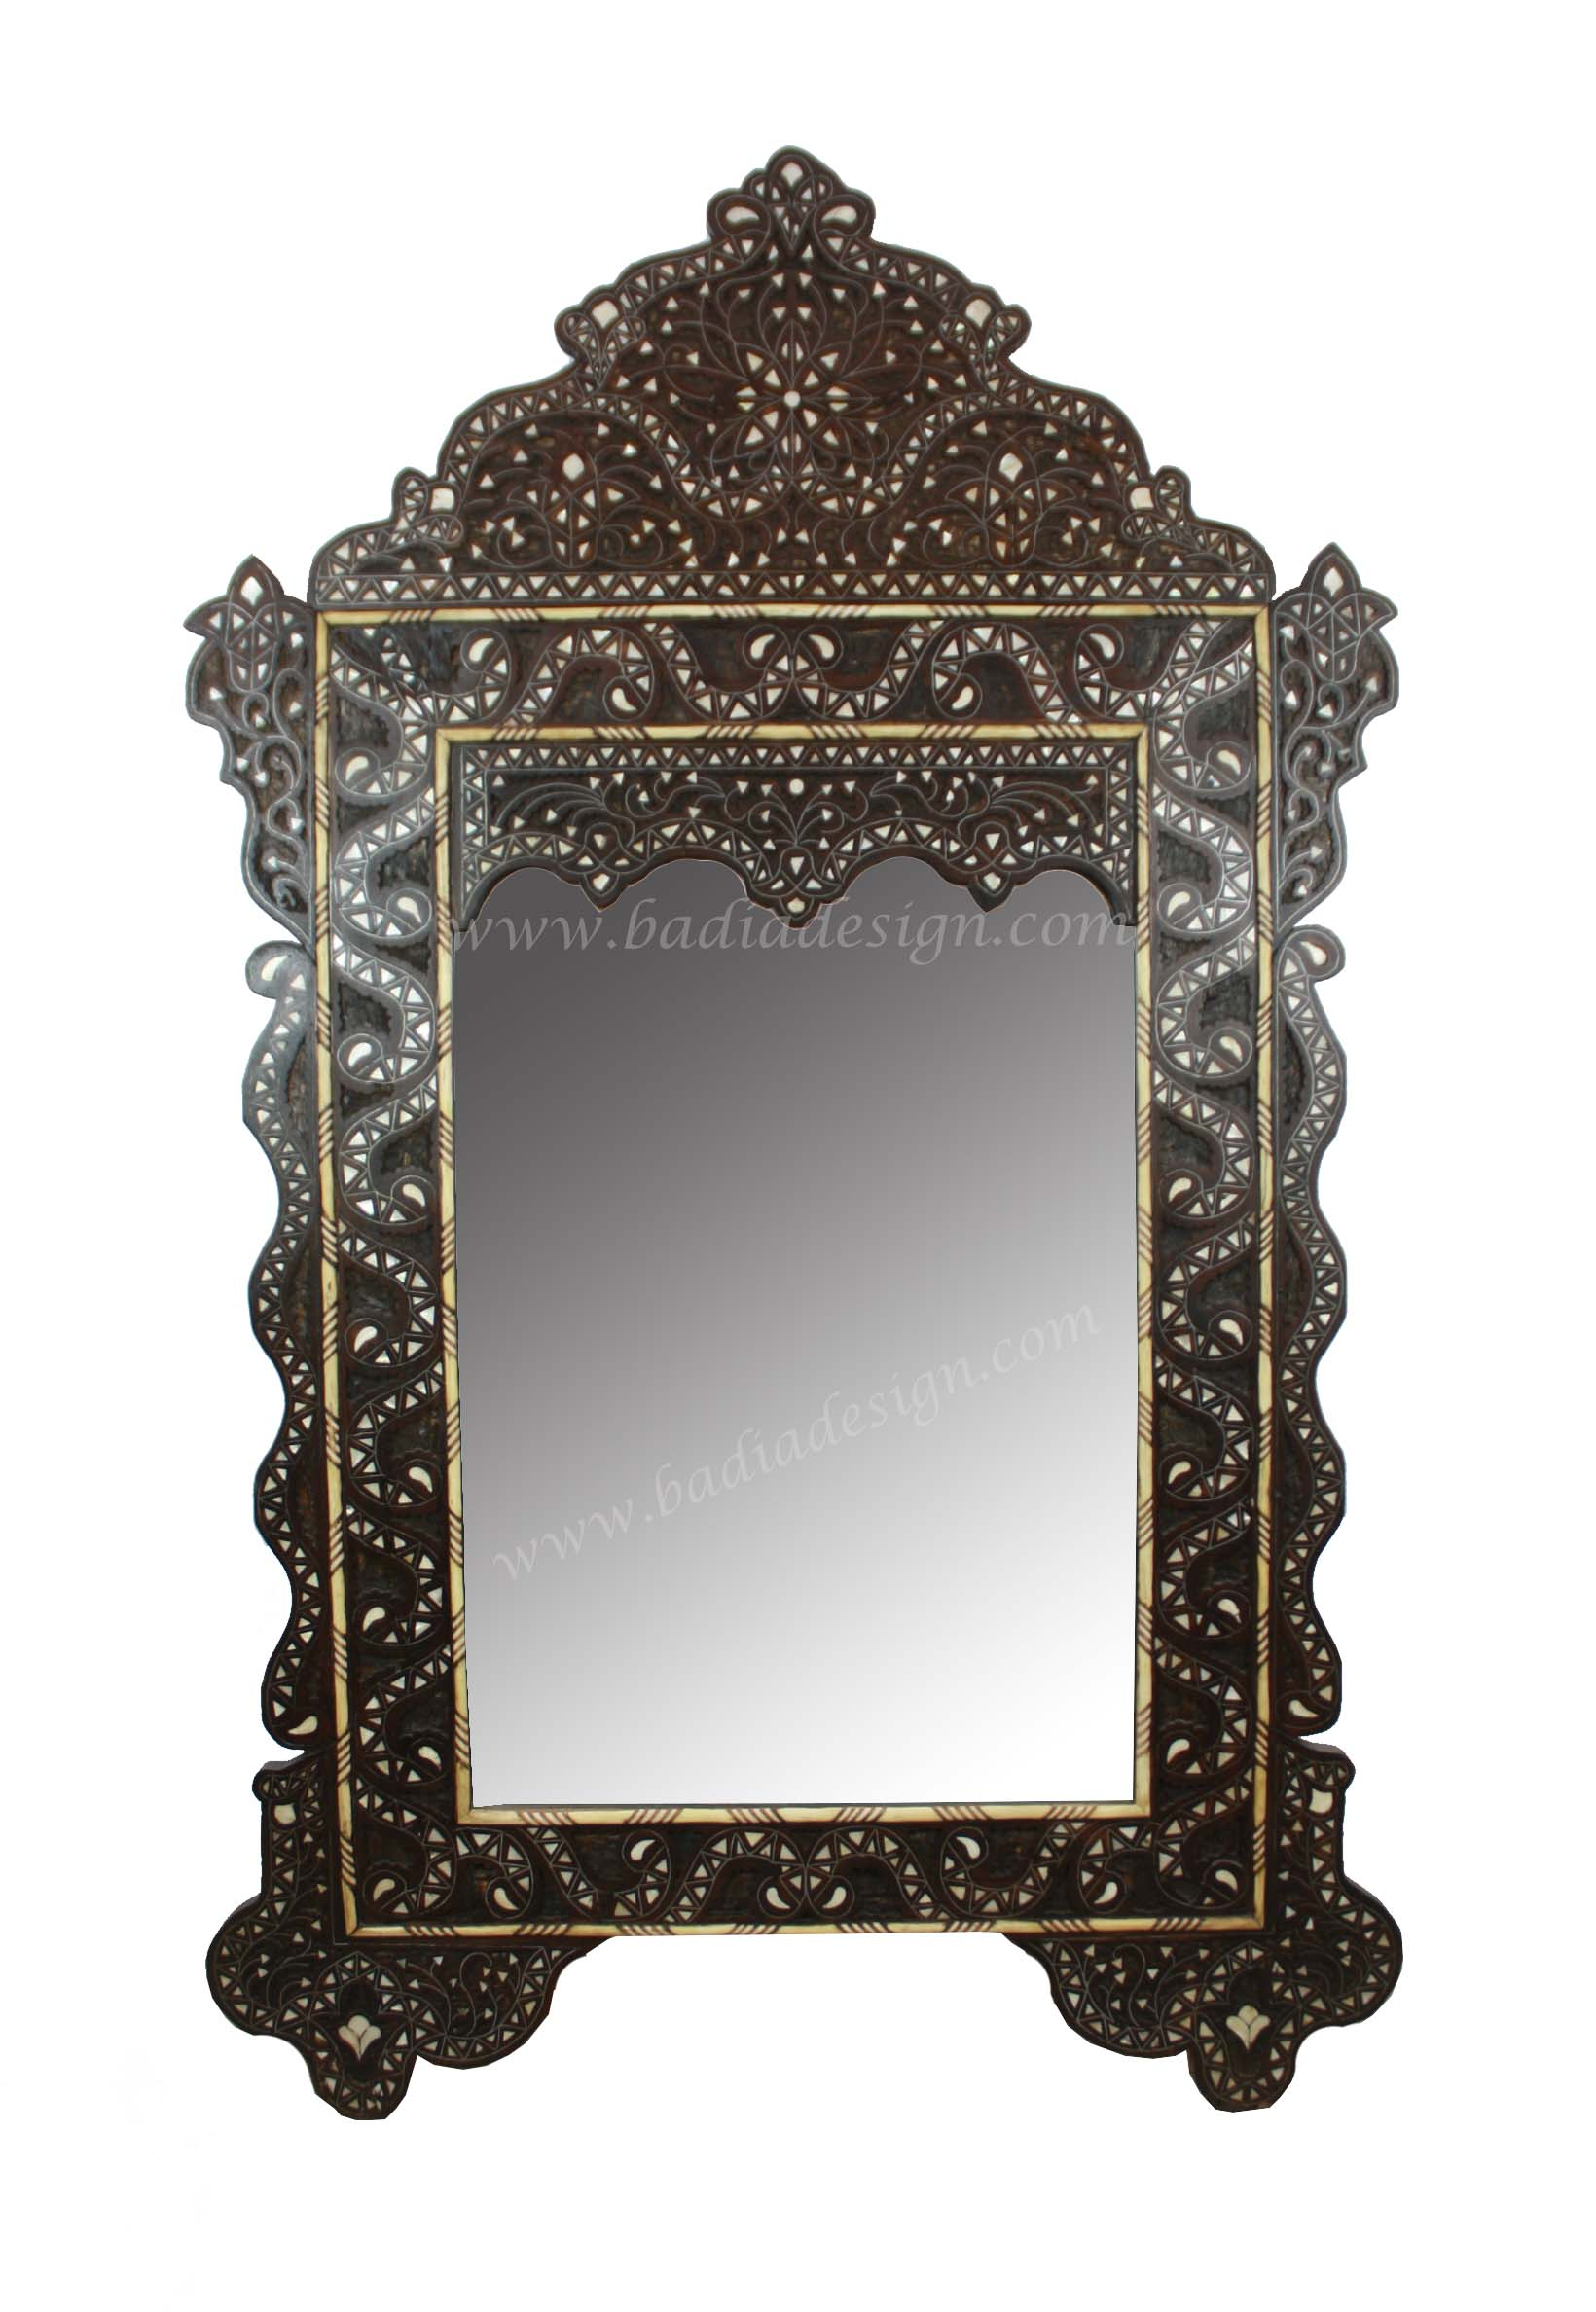 moroccan-bone-inlay-mirror-m-mop031.jpg